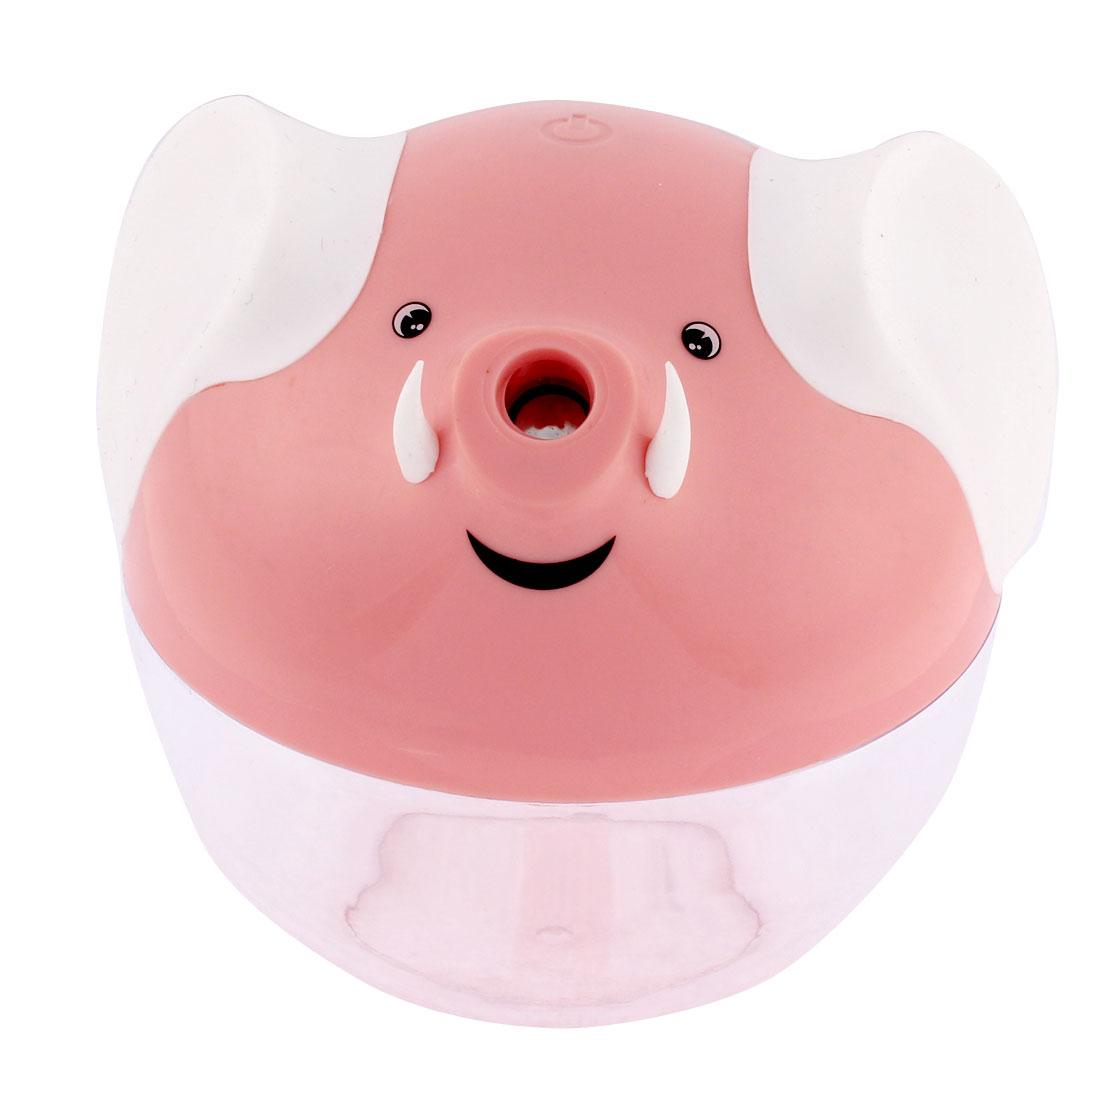 LED Mood Lights Lucky Elephant Shape Mist Air Humidifier Pink w 1M USB Line